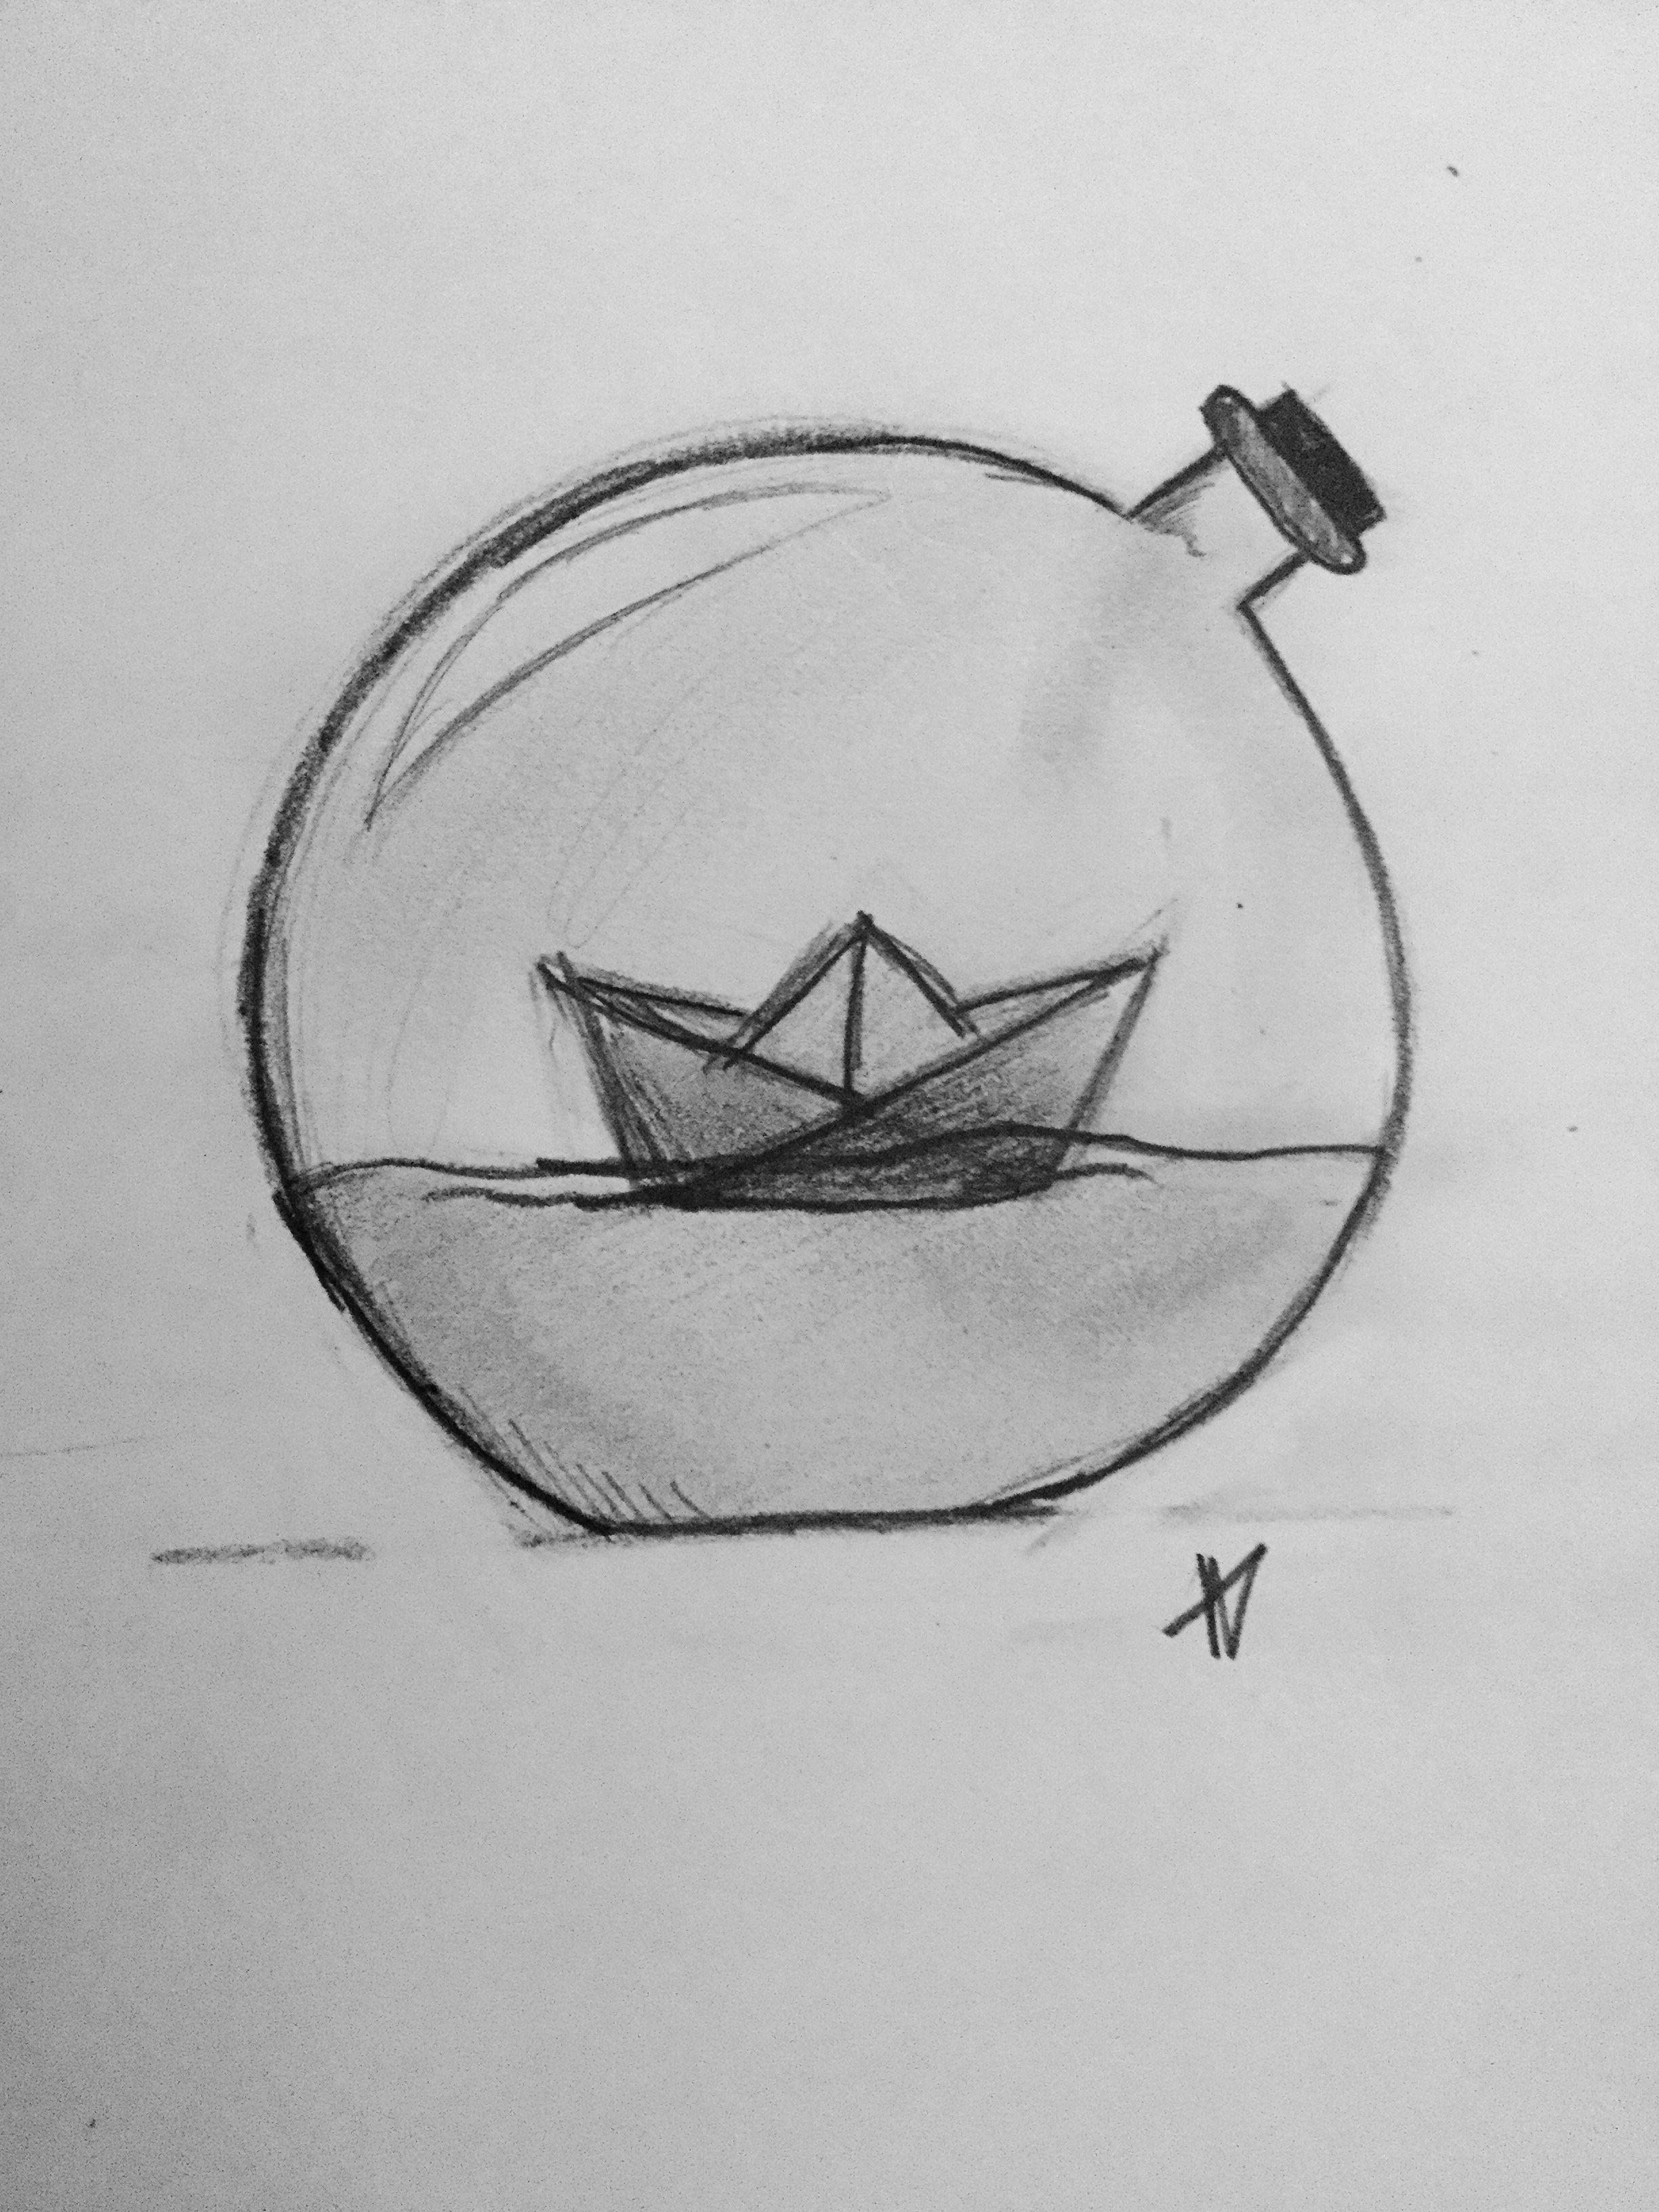 Bottleboat Dibujos A Lapiz Sencillos Bocetos Faciles De Dibujar Dibujos A Lapiz Dificiles